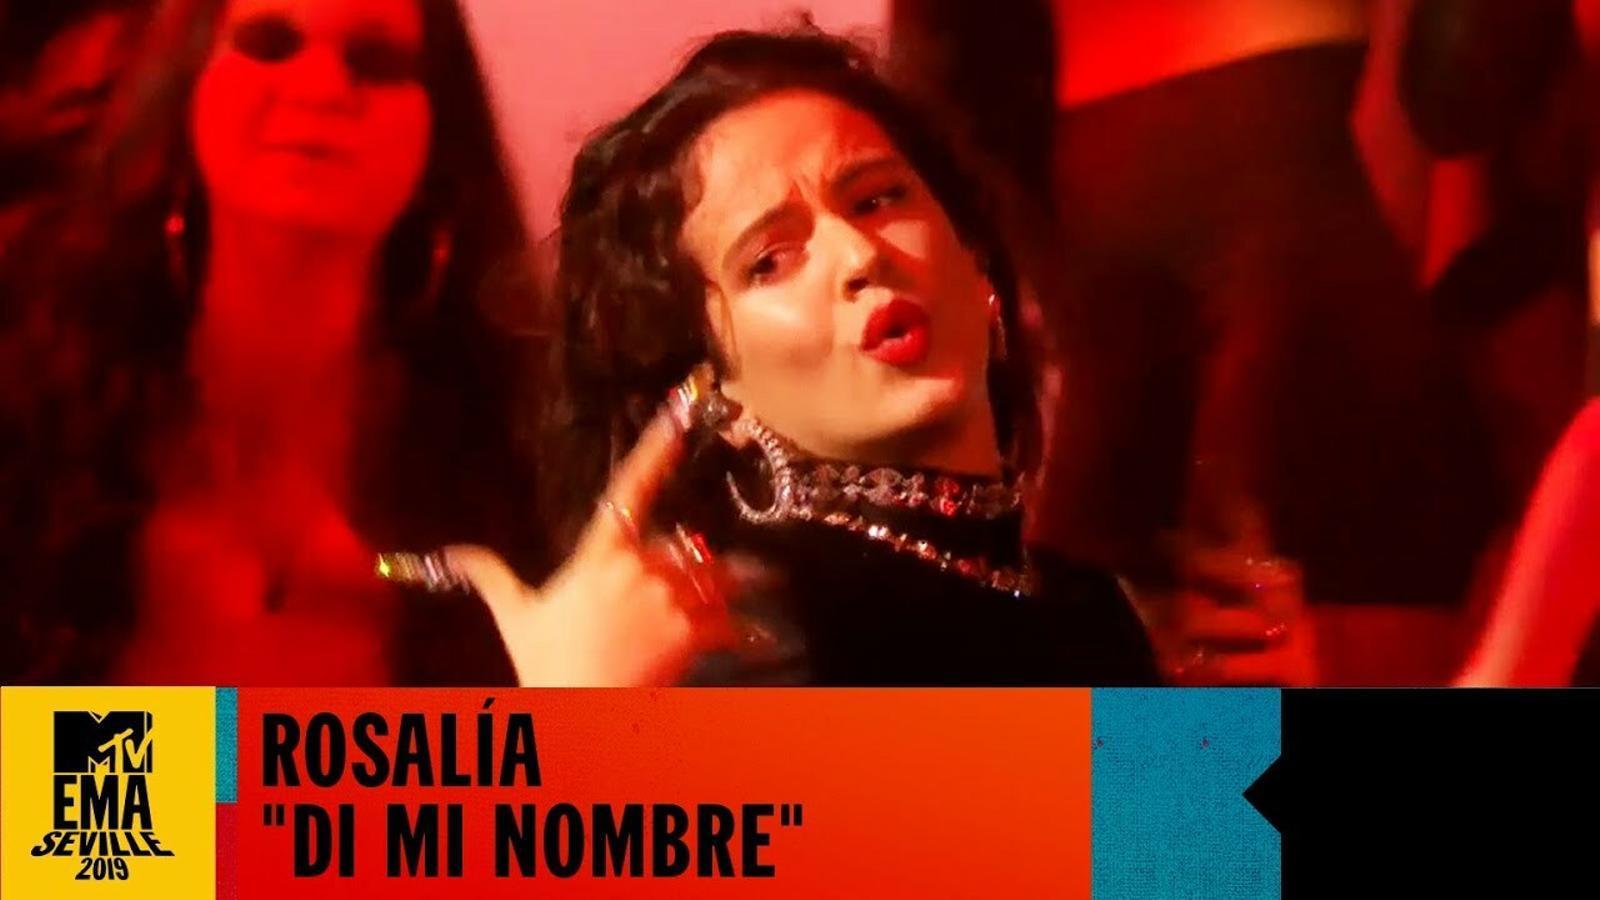 'Di mi nombre':  Rosalía als European Music Awards